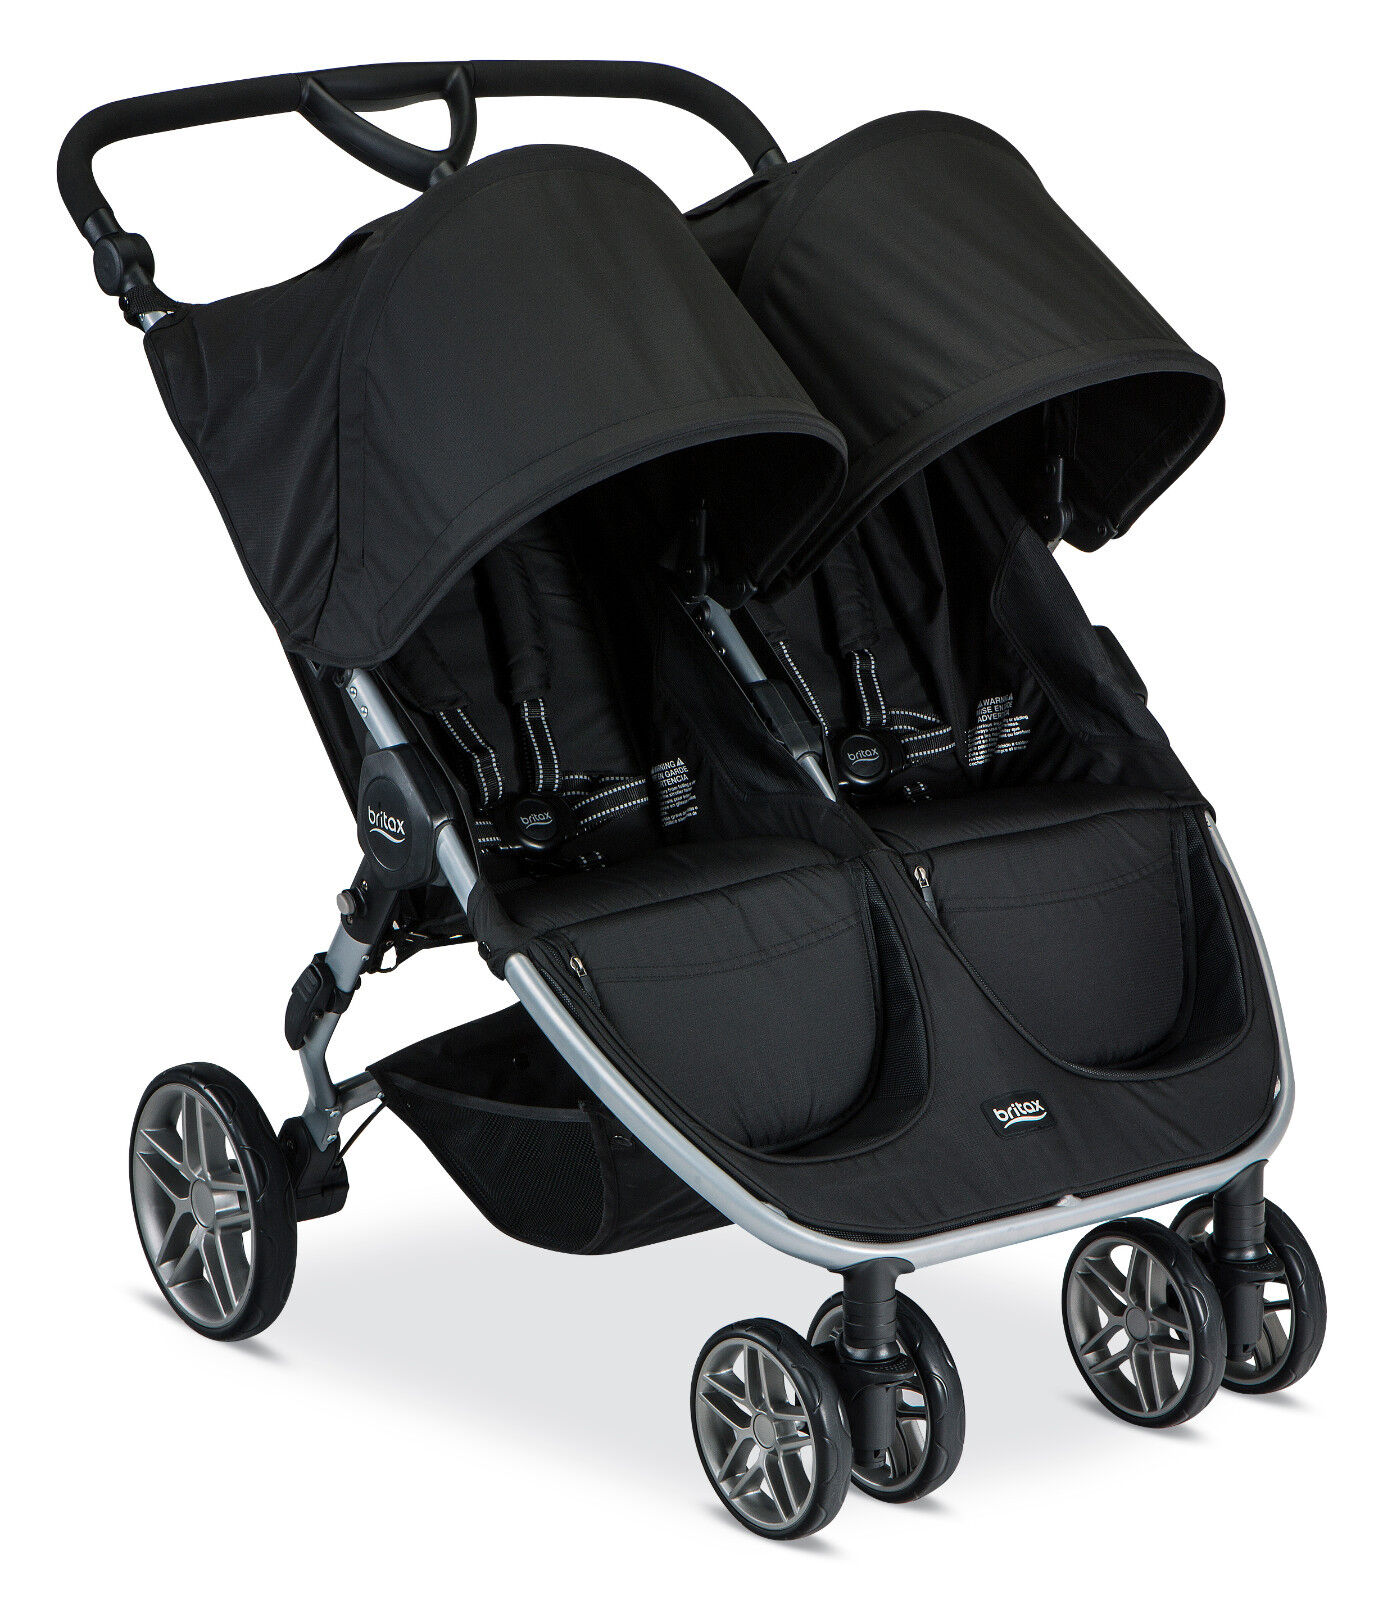 Britax 2016 B-Agile Double Stroller - Black - Brand New! Fre